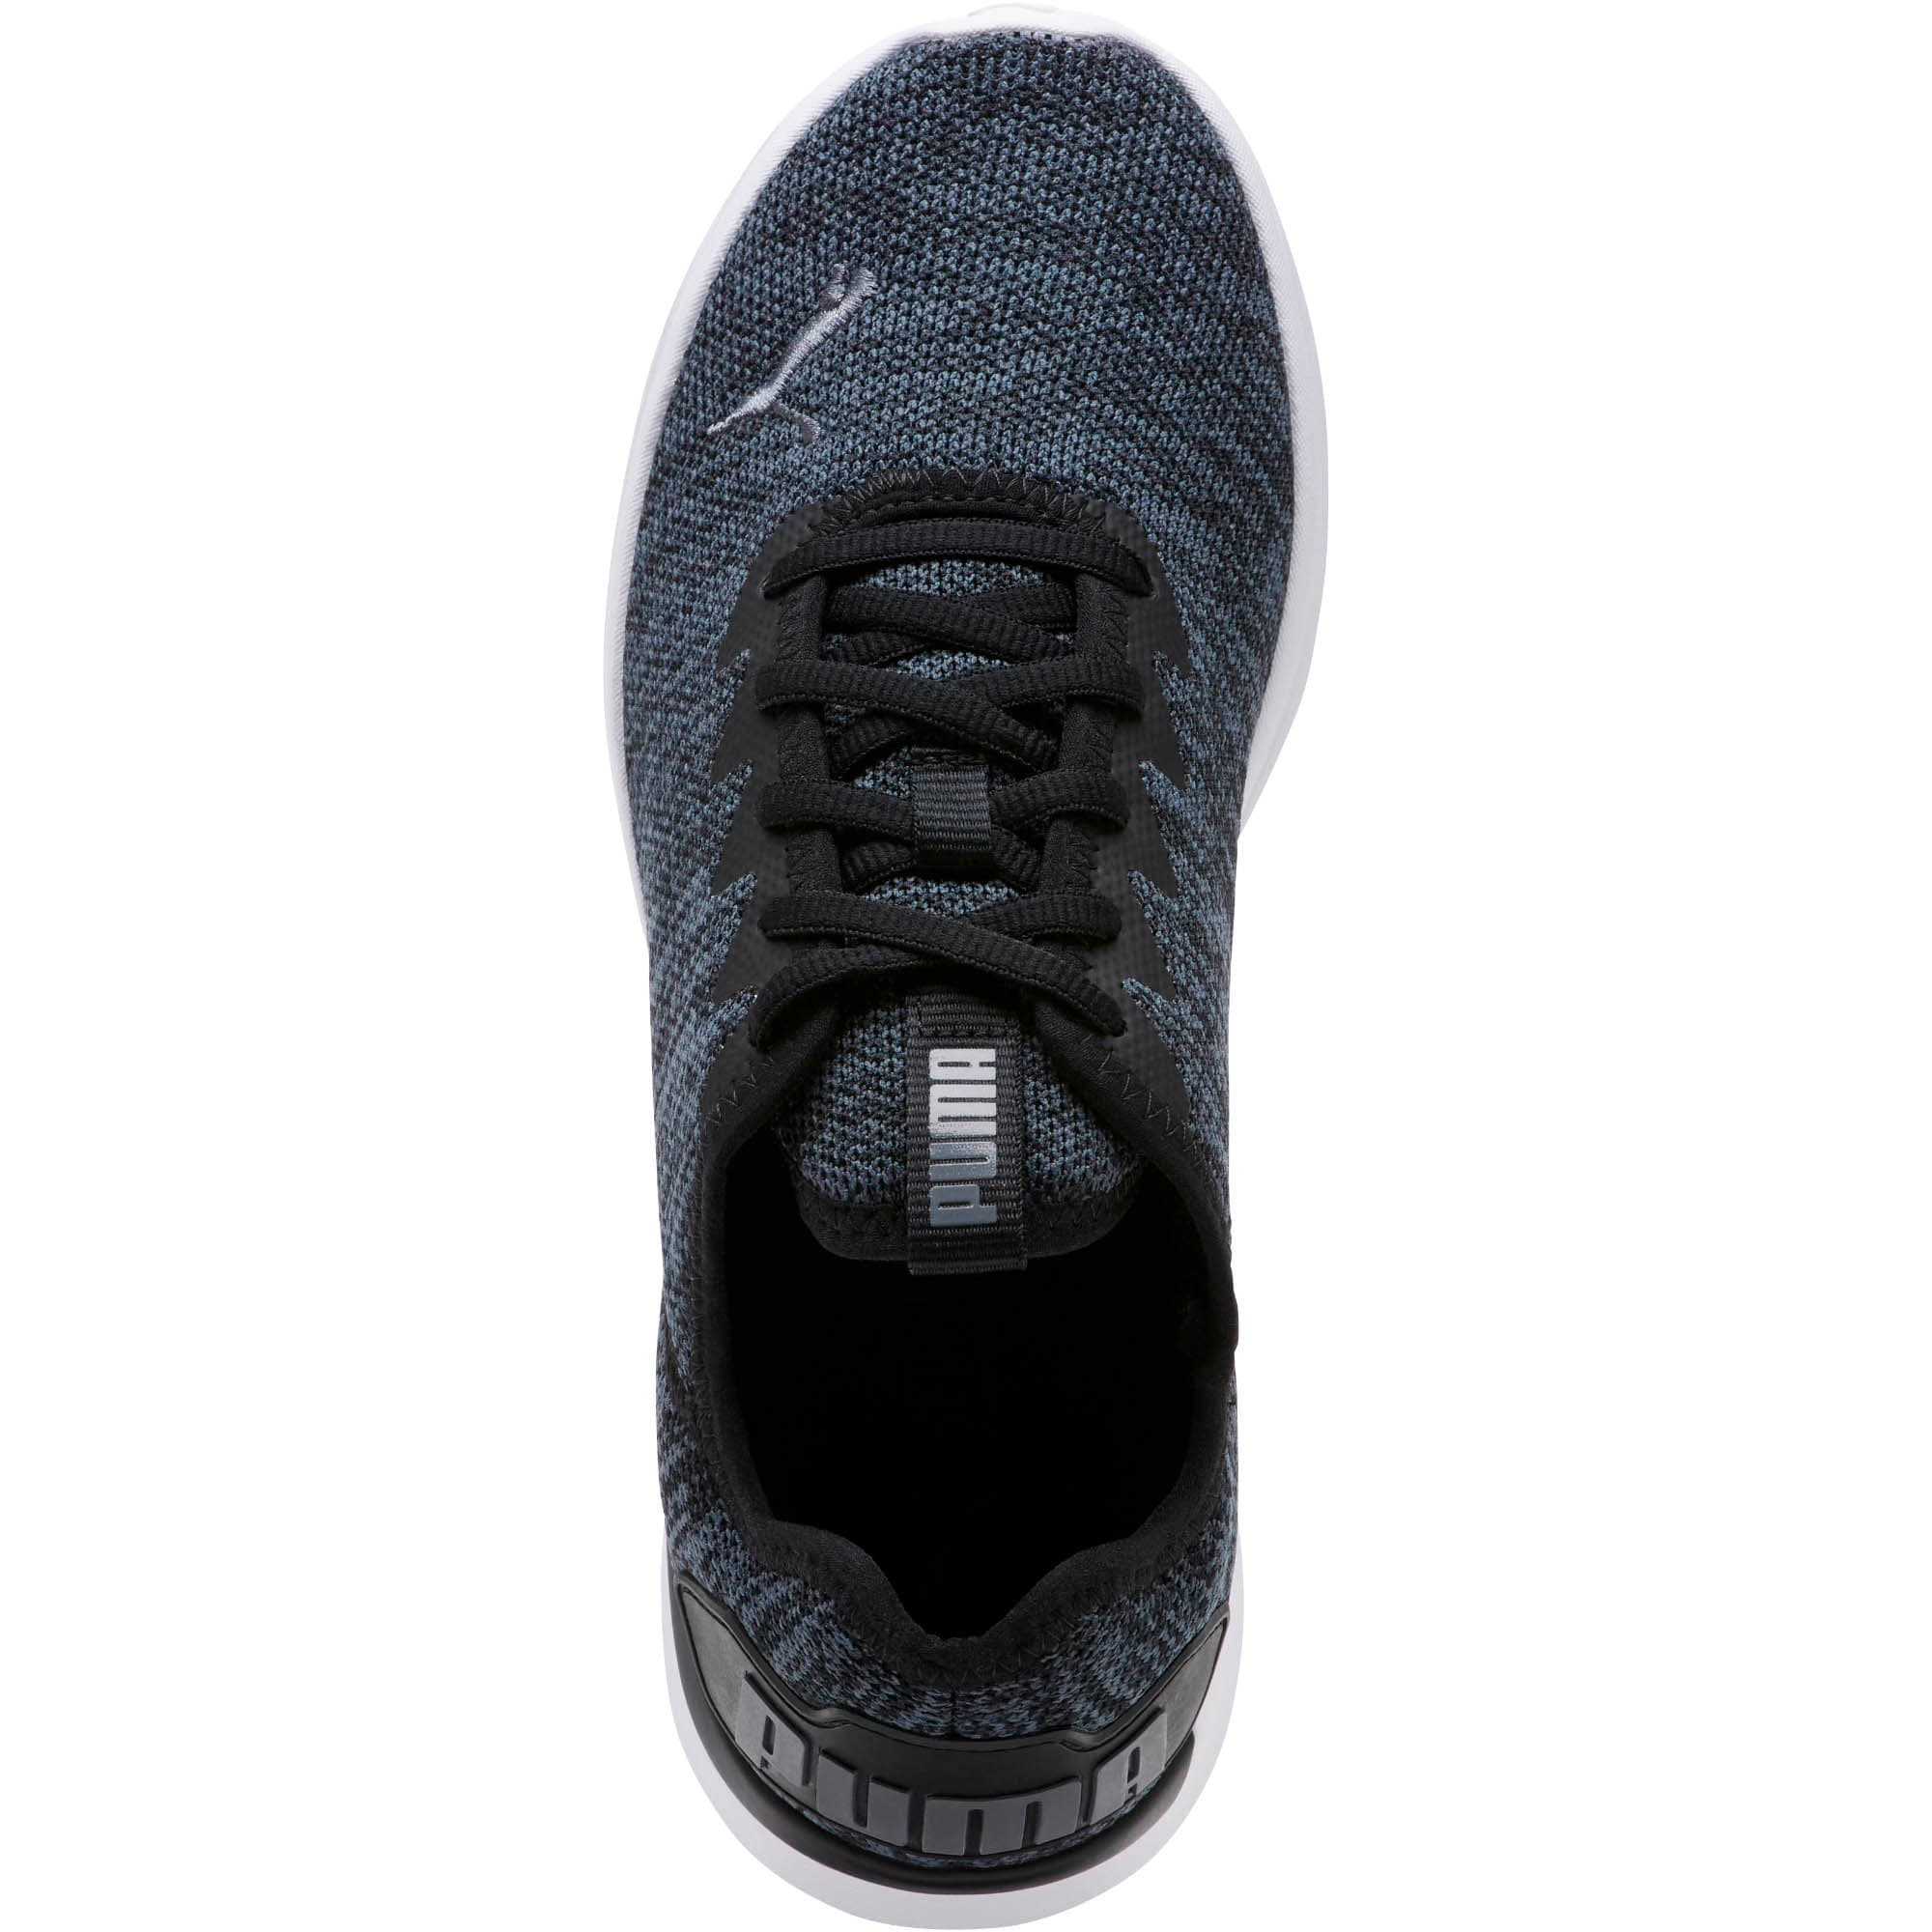 Thumbnail 5 of Ballast Women's Running Shoes, Puma Black-Iron Gate, medium